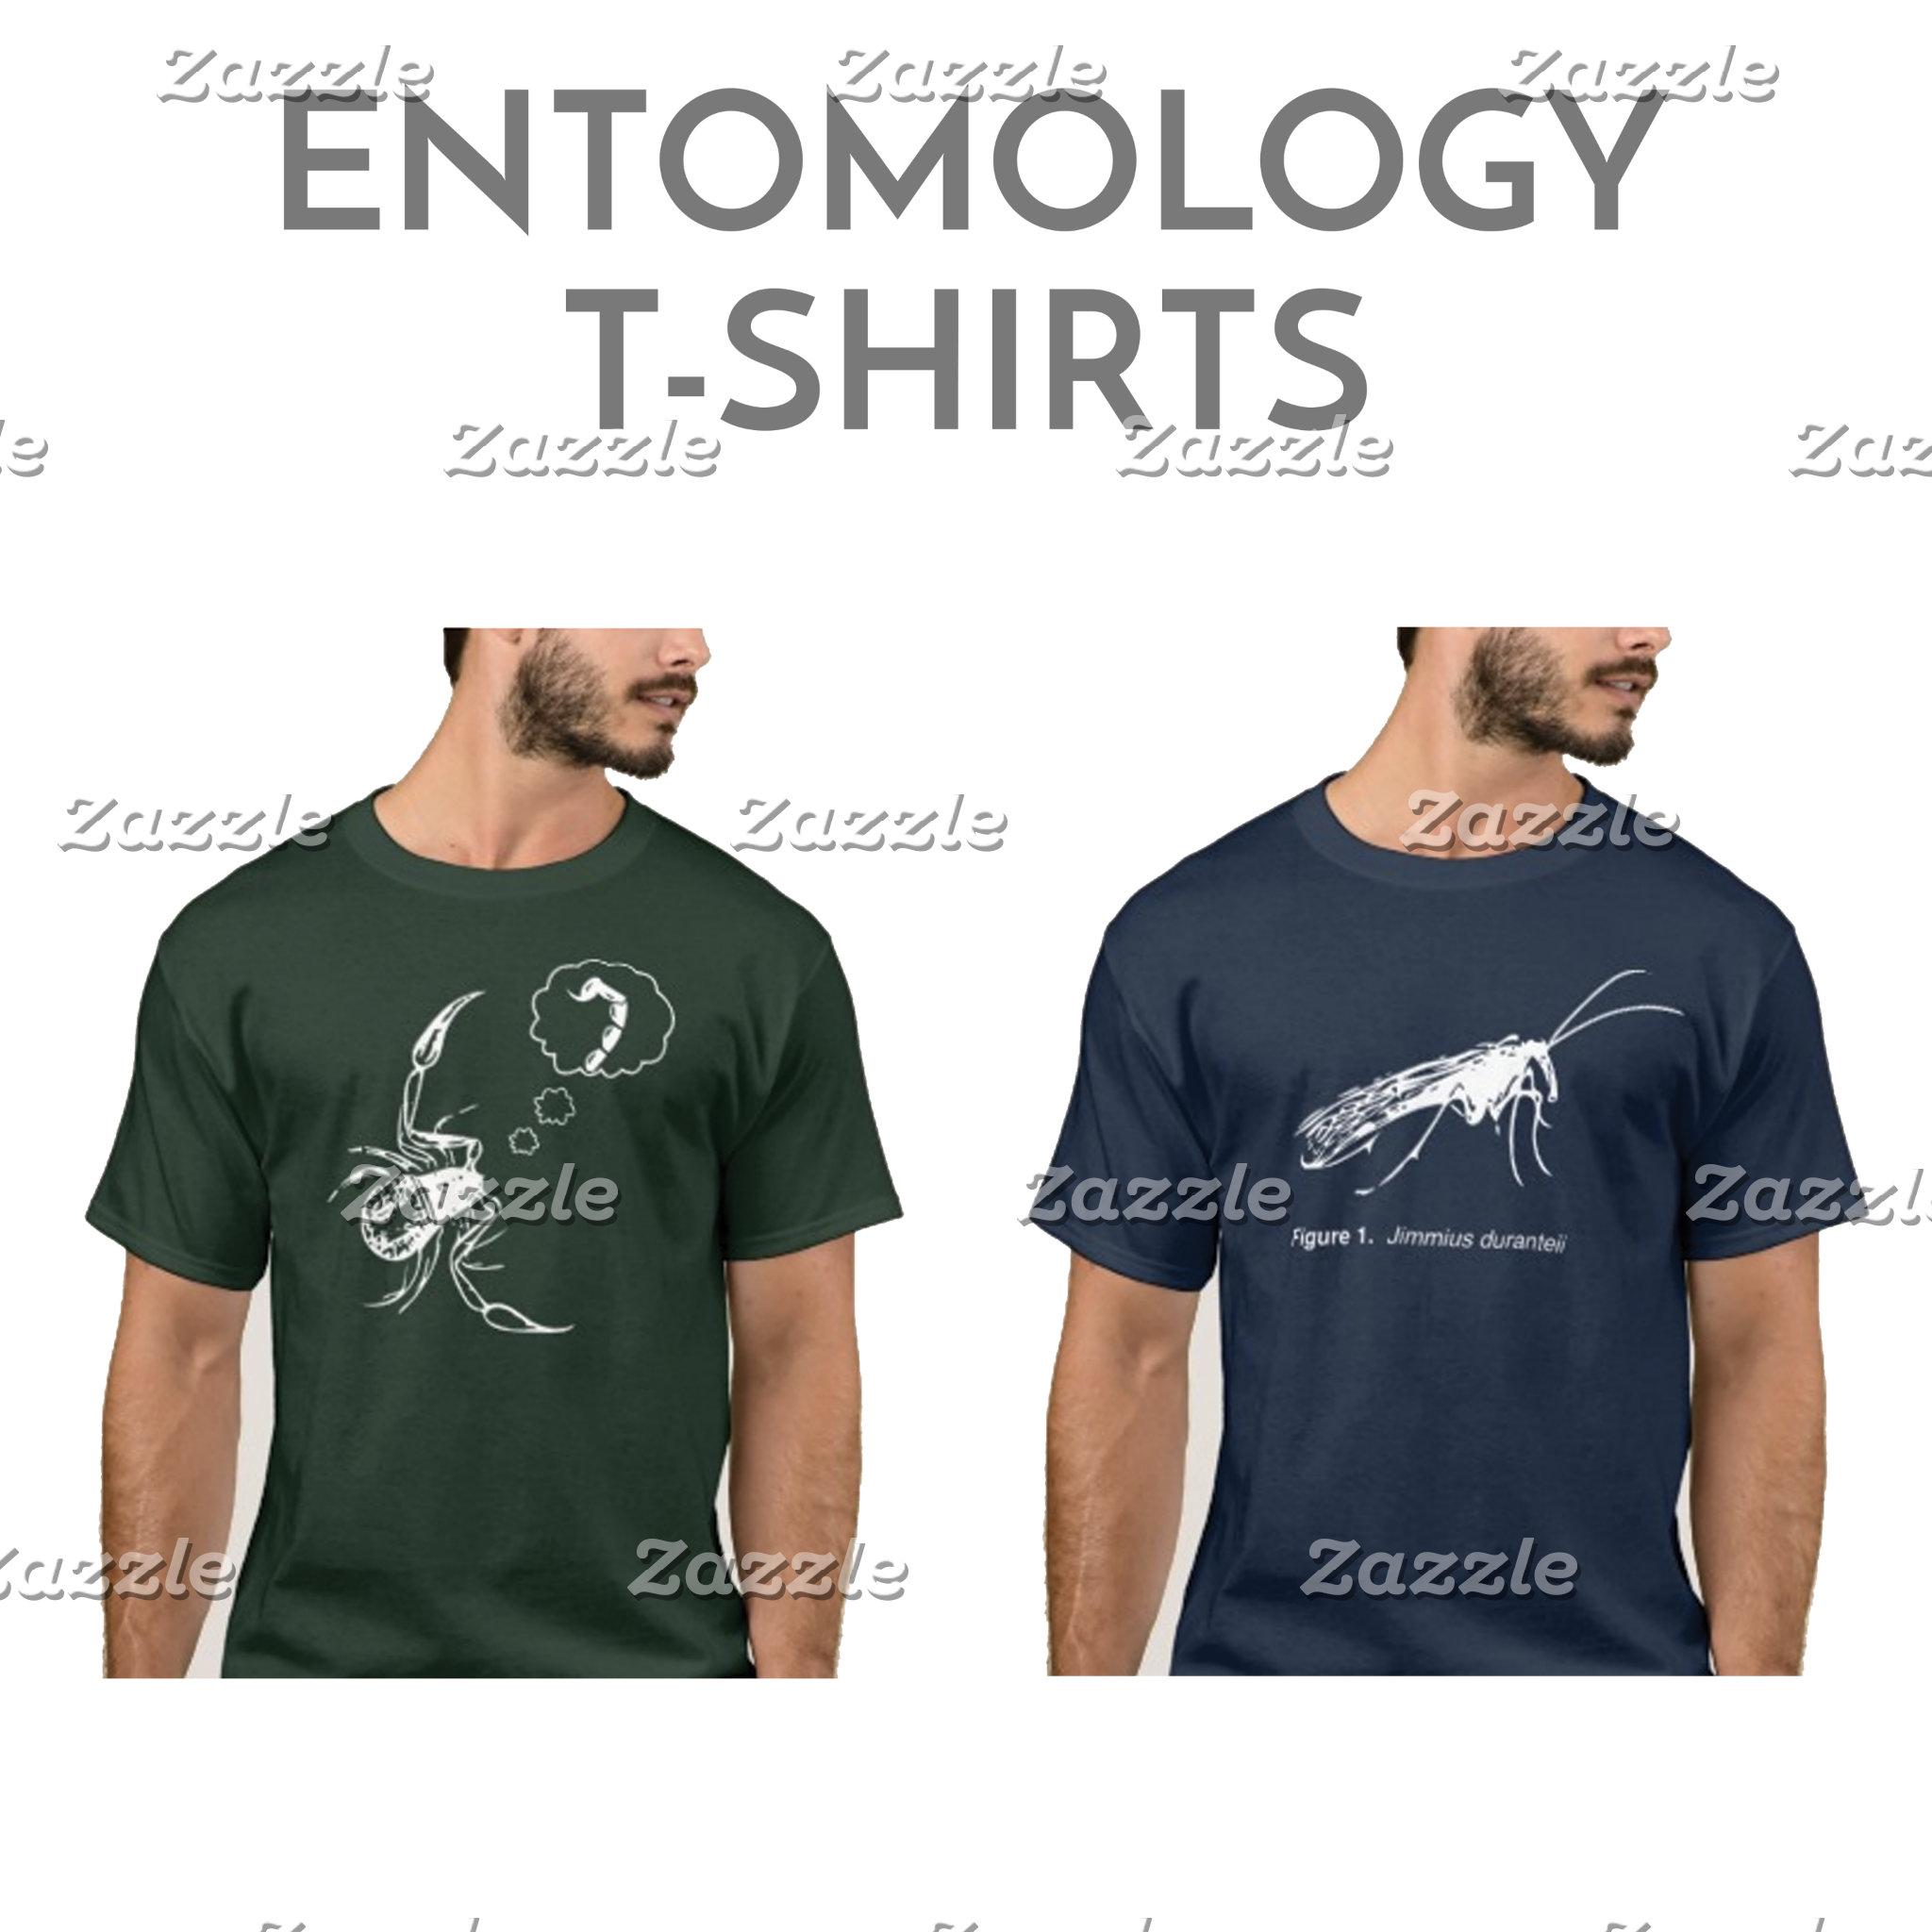 Entomology T-shirts